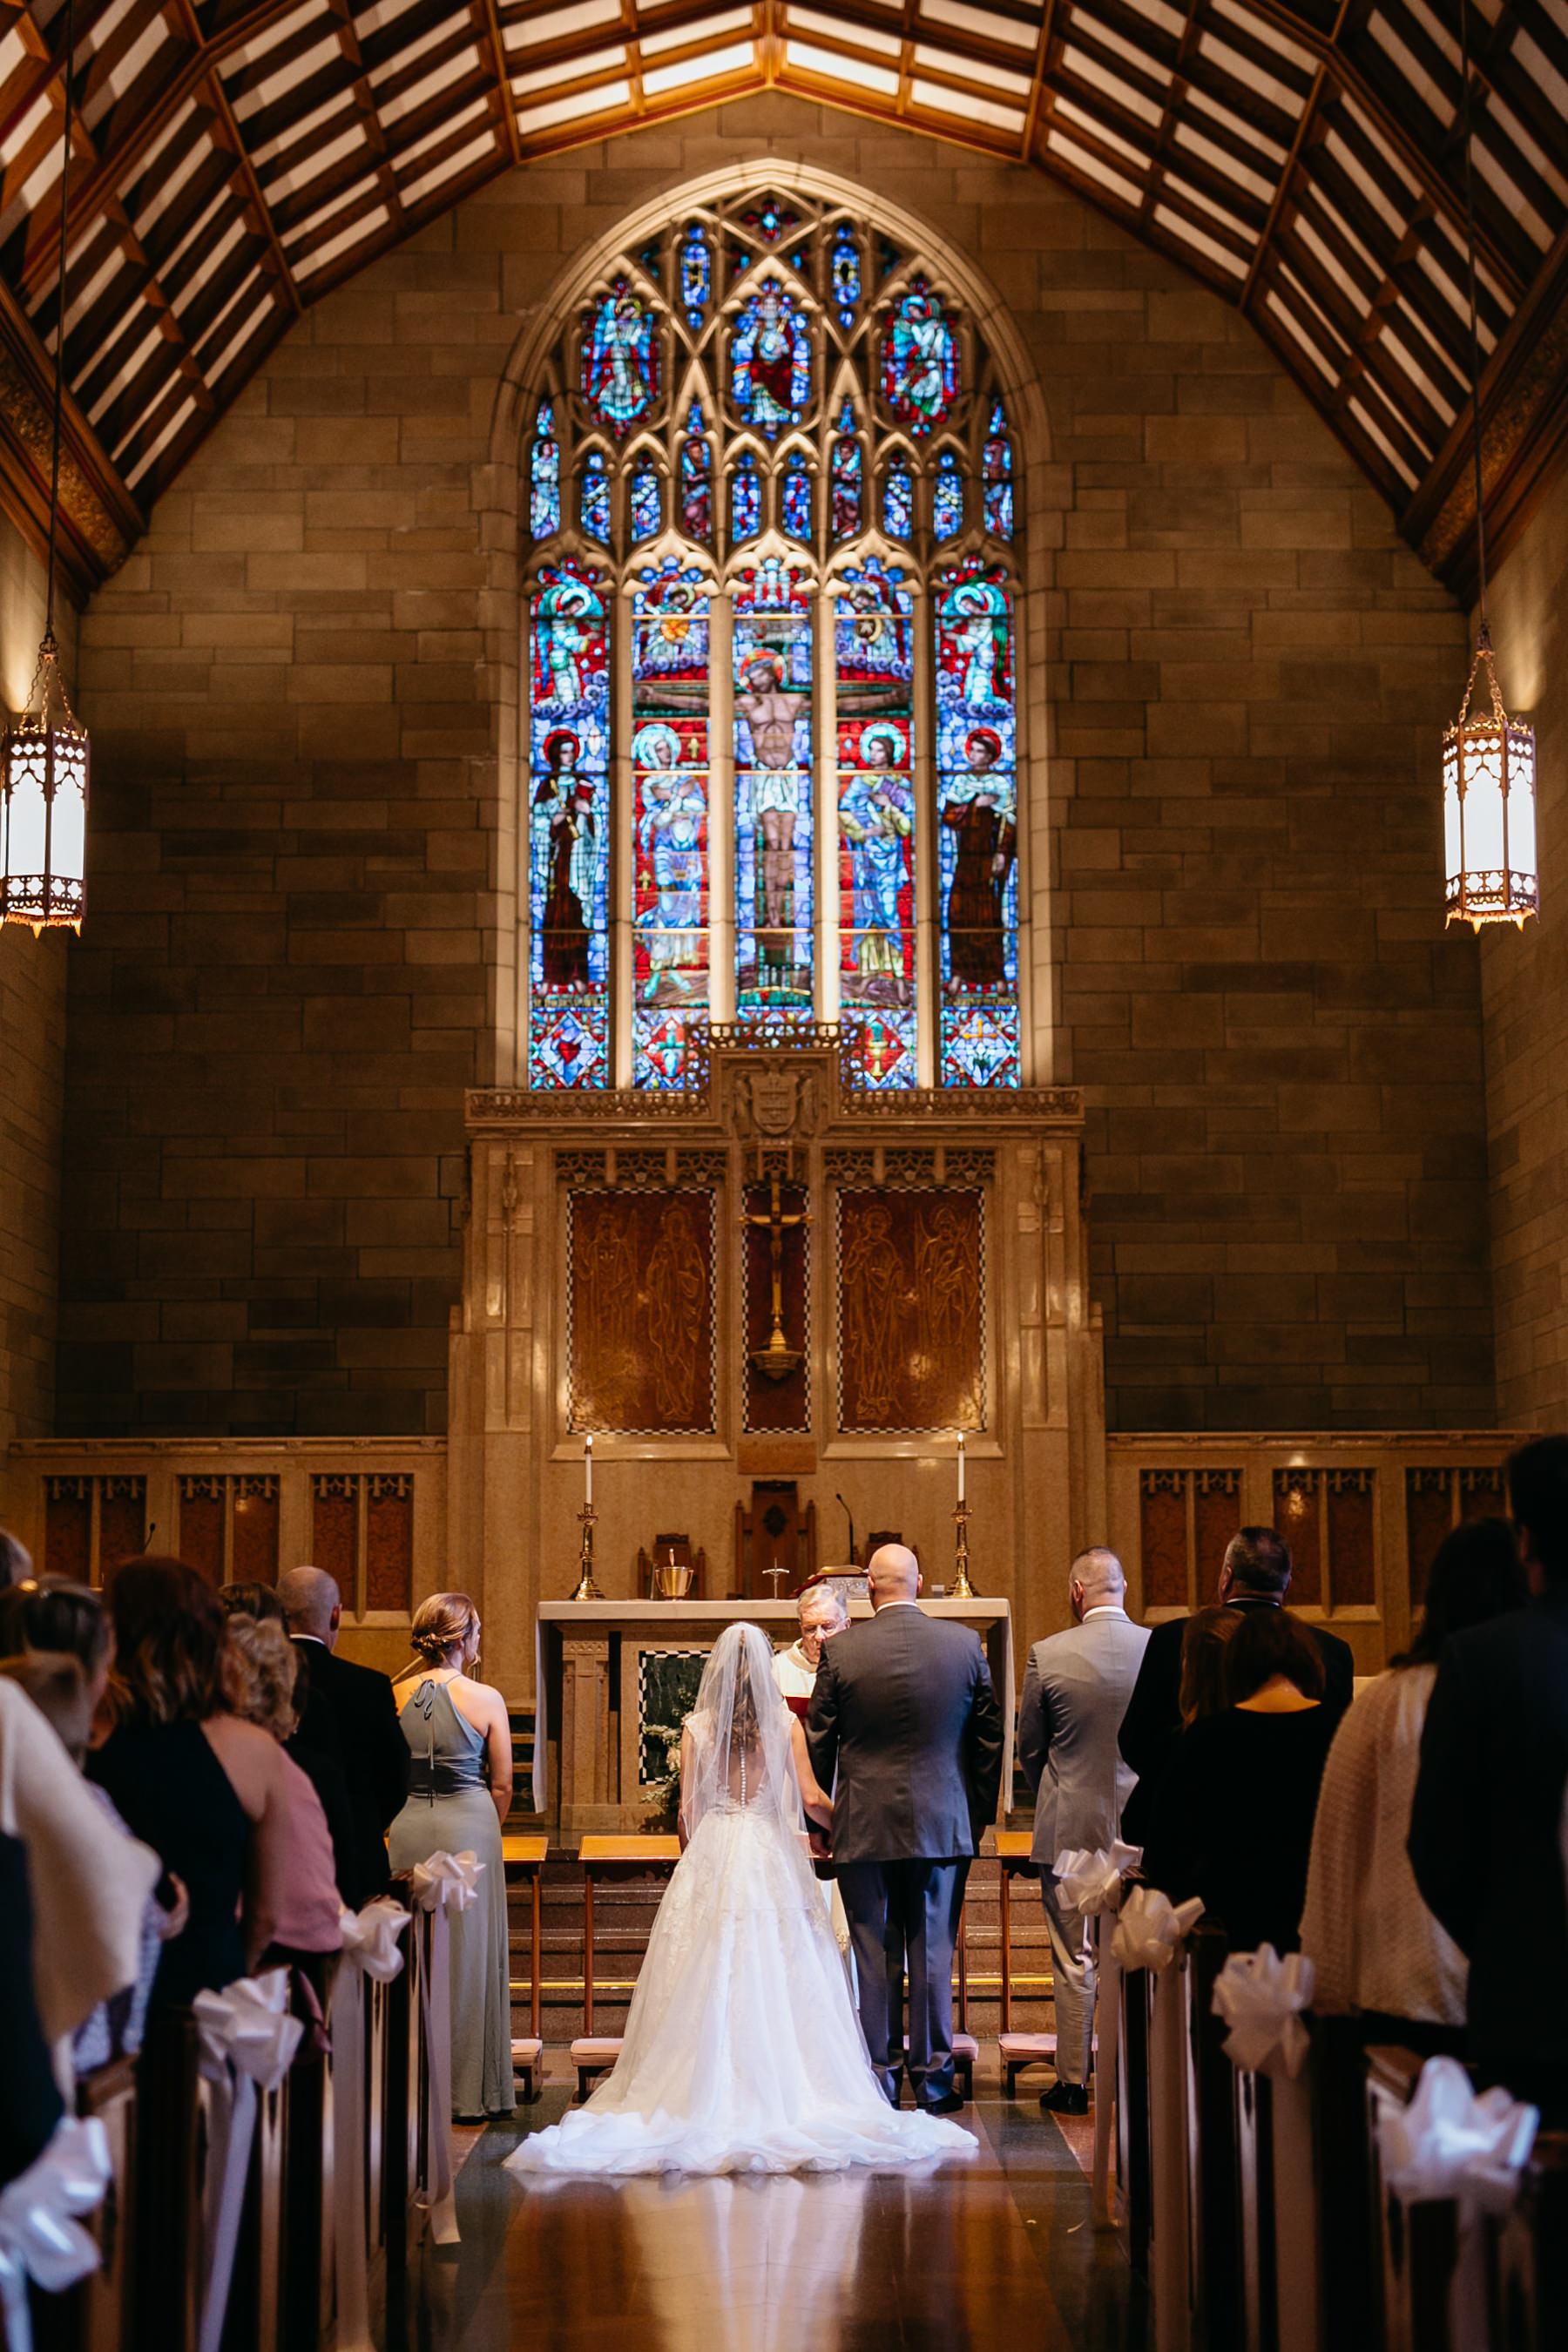 Quincy Ma Massachusetts Wedding Dedham Boston Granie Links Wedding New England Catholic Cathedral Liz Osban Photography 42.jpg